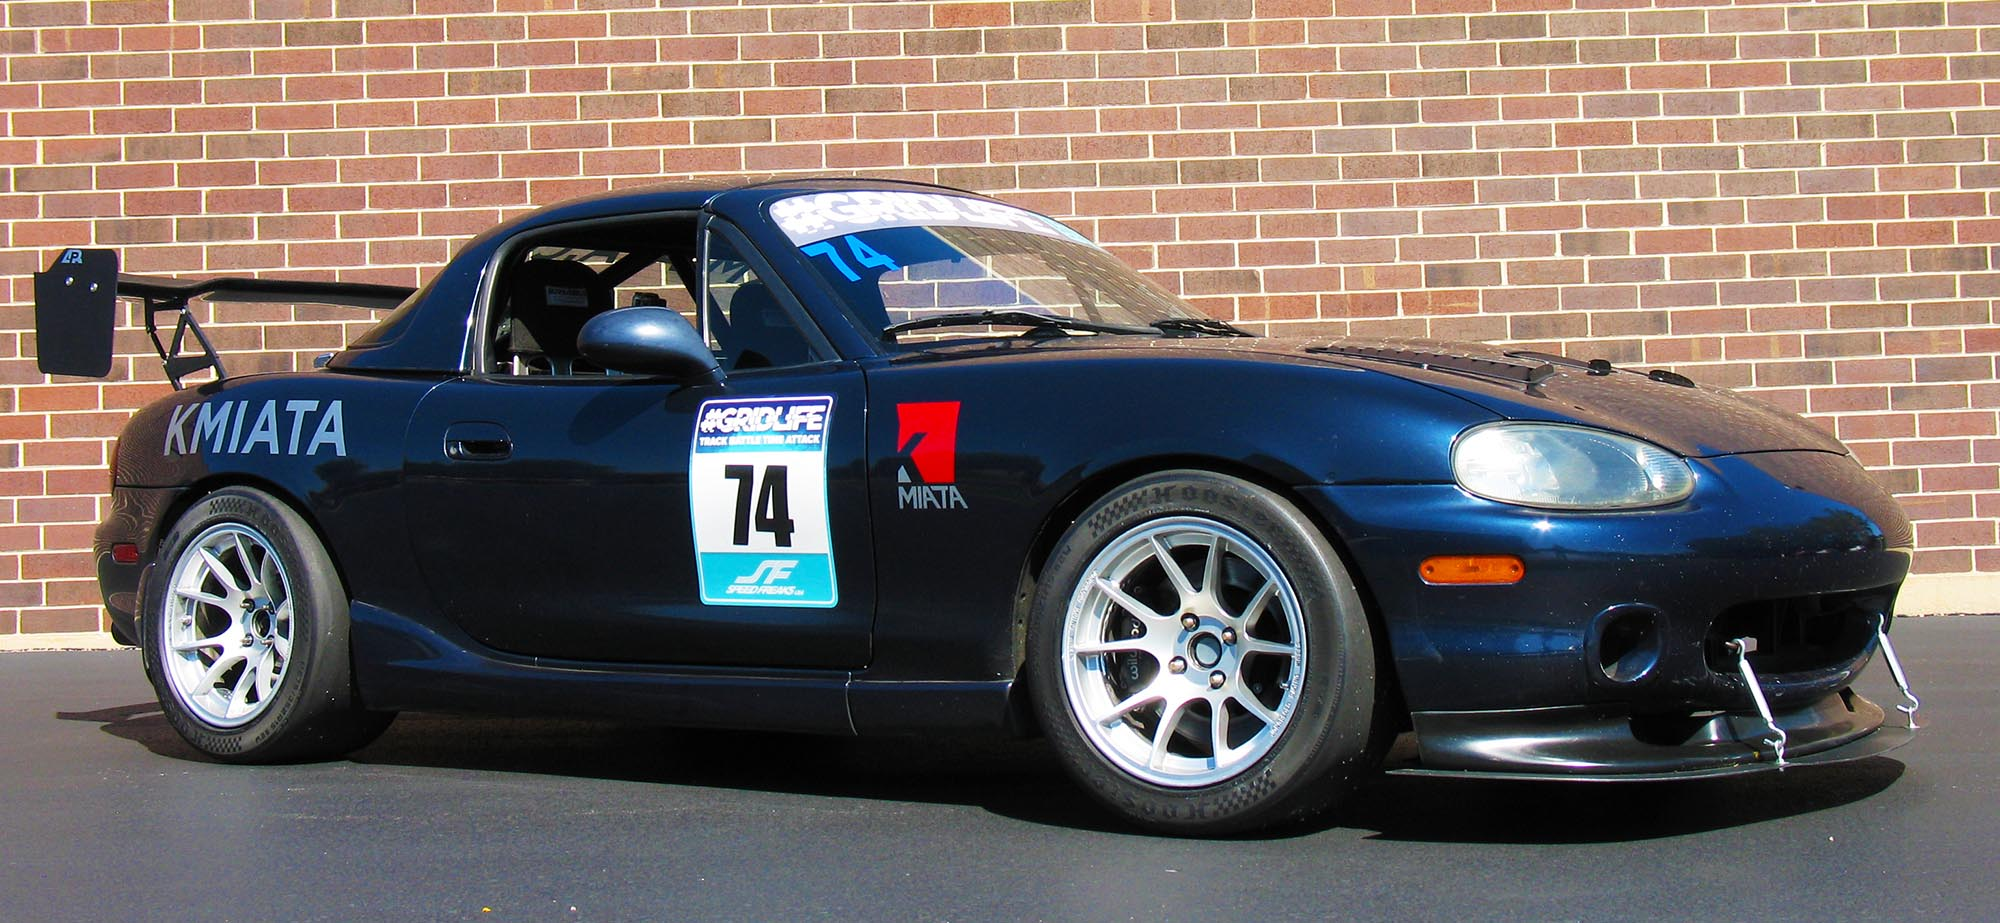 KMiata| Grassroots Motorsports forum |